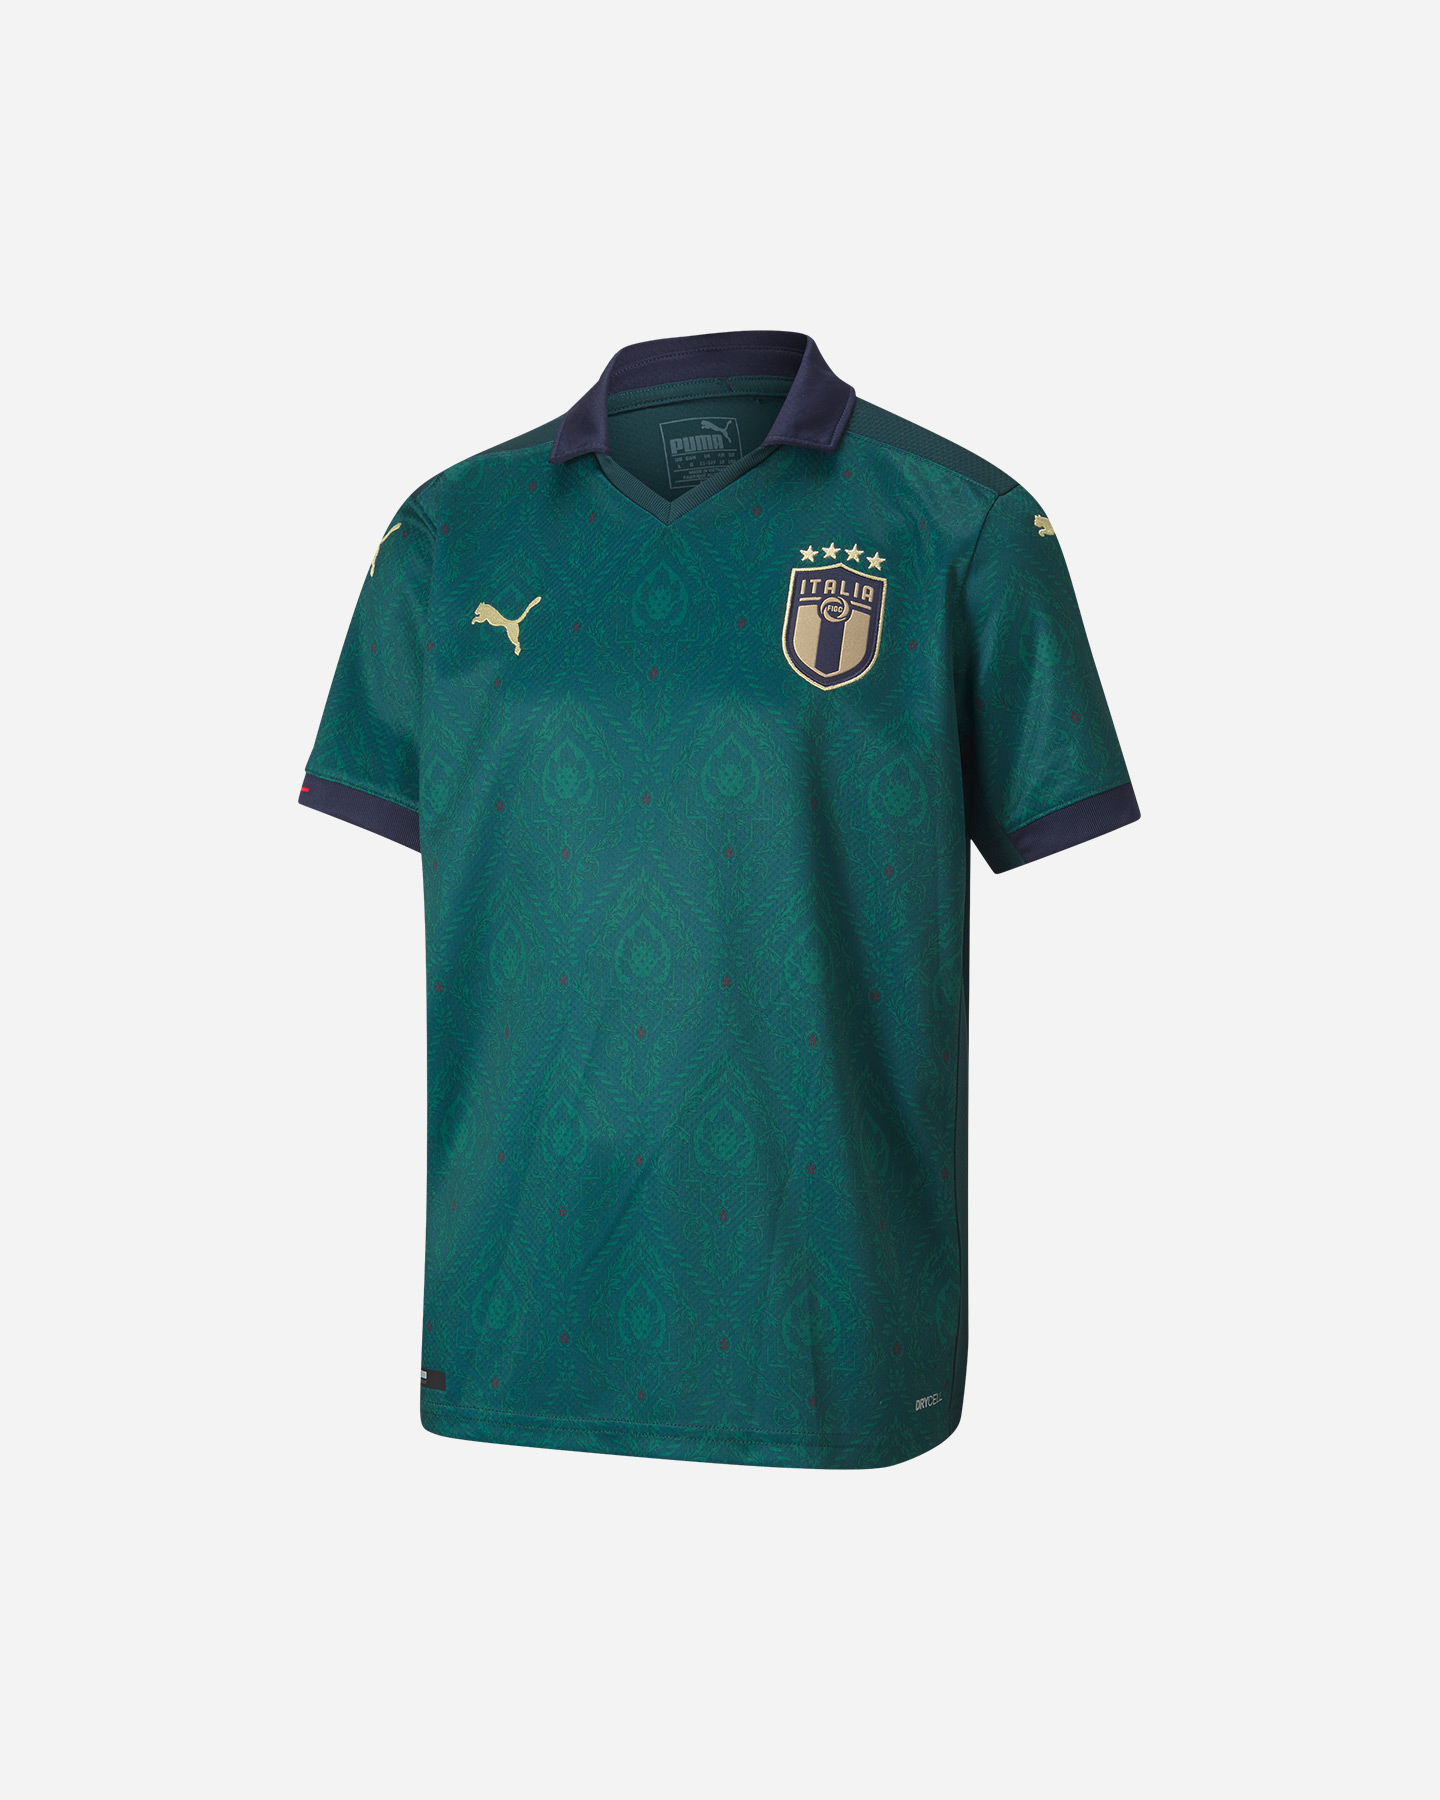 Puma - Italia Figc Third Jr - Maglia Calcio - Bambino